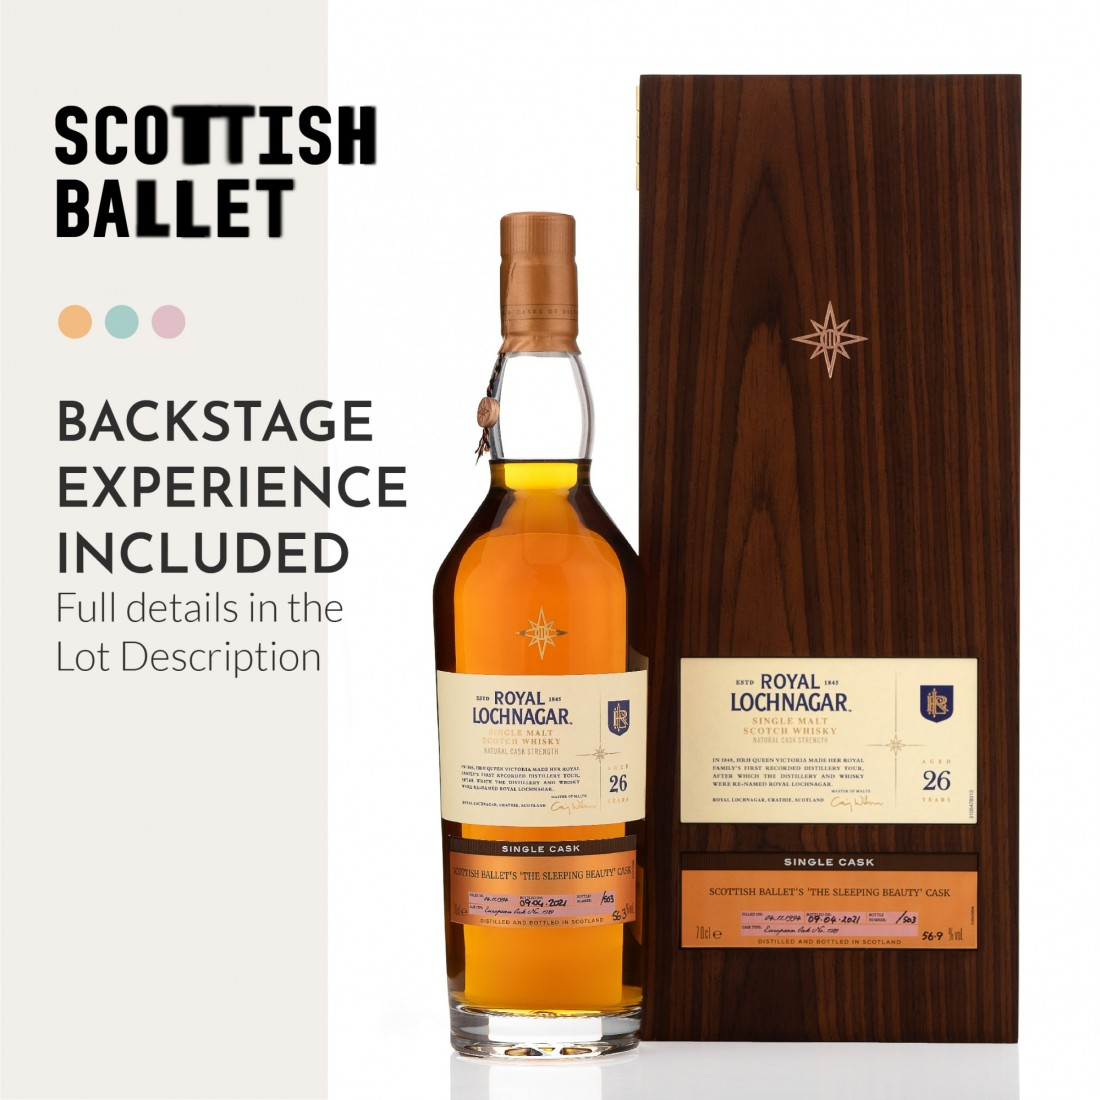 Royal Lochnagar 1994 Casks of Distinction 26 Year Old #1289 / Bottle #006